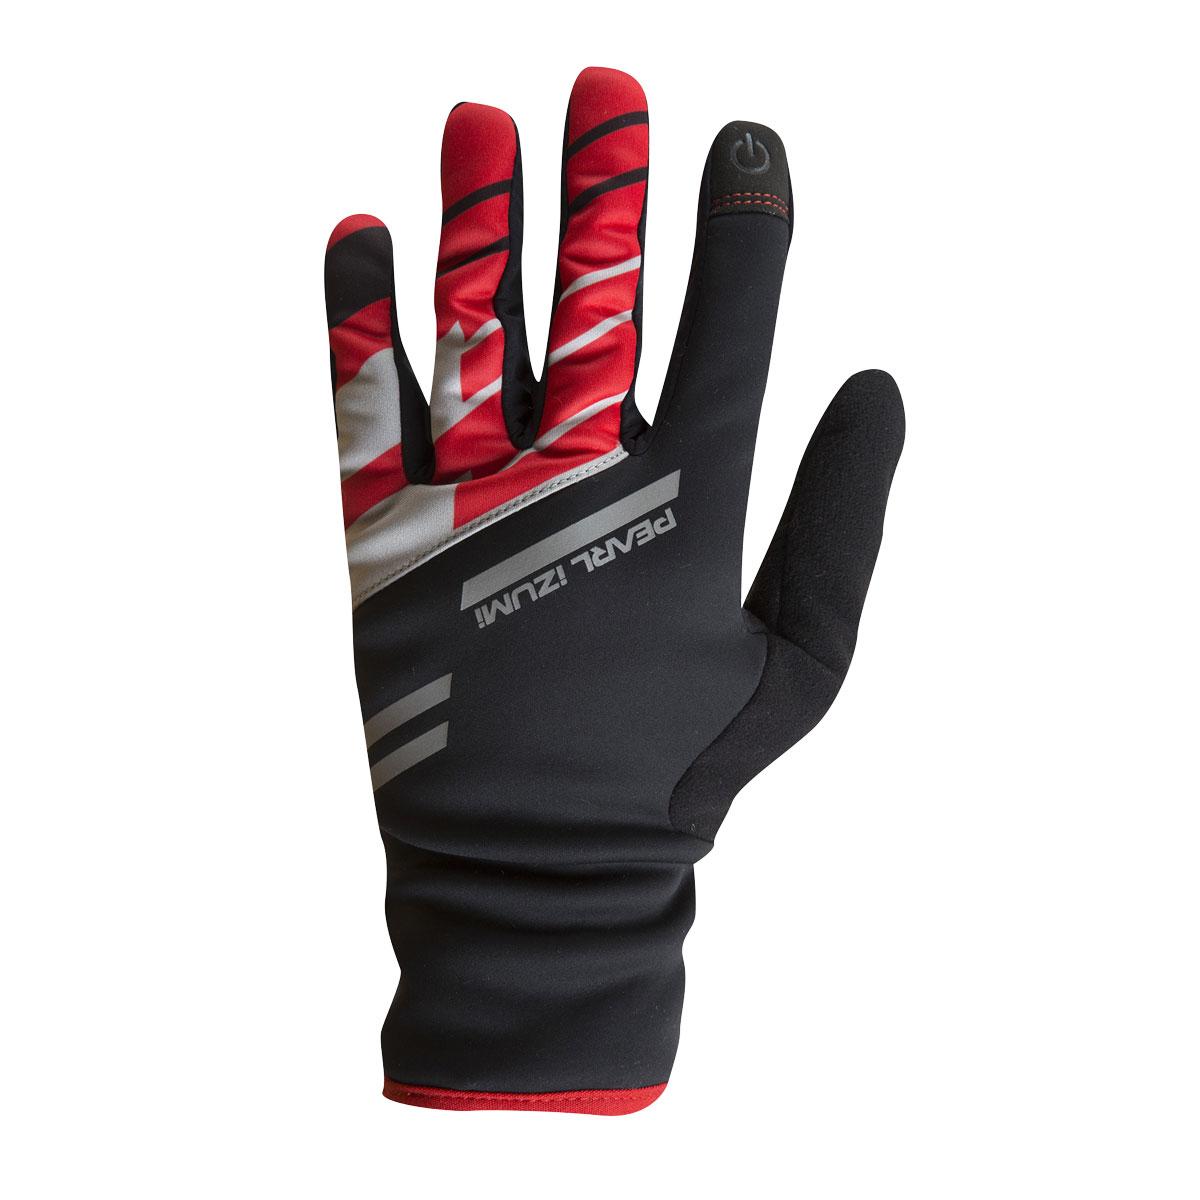 PEARL iZUMi PRO SOFTSHELL LITE rukavice, TRUE červená, L